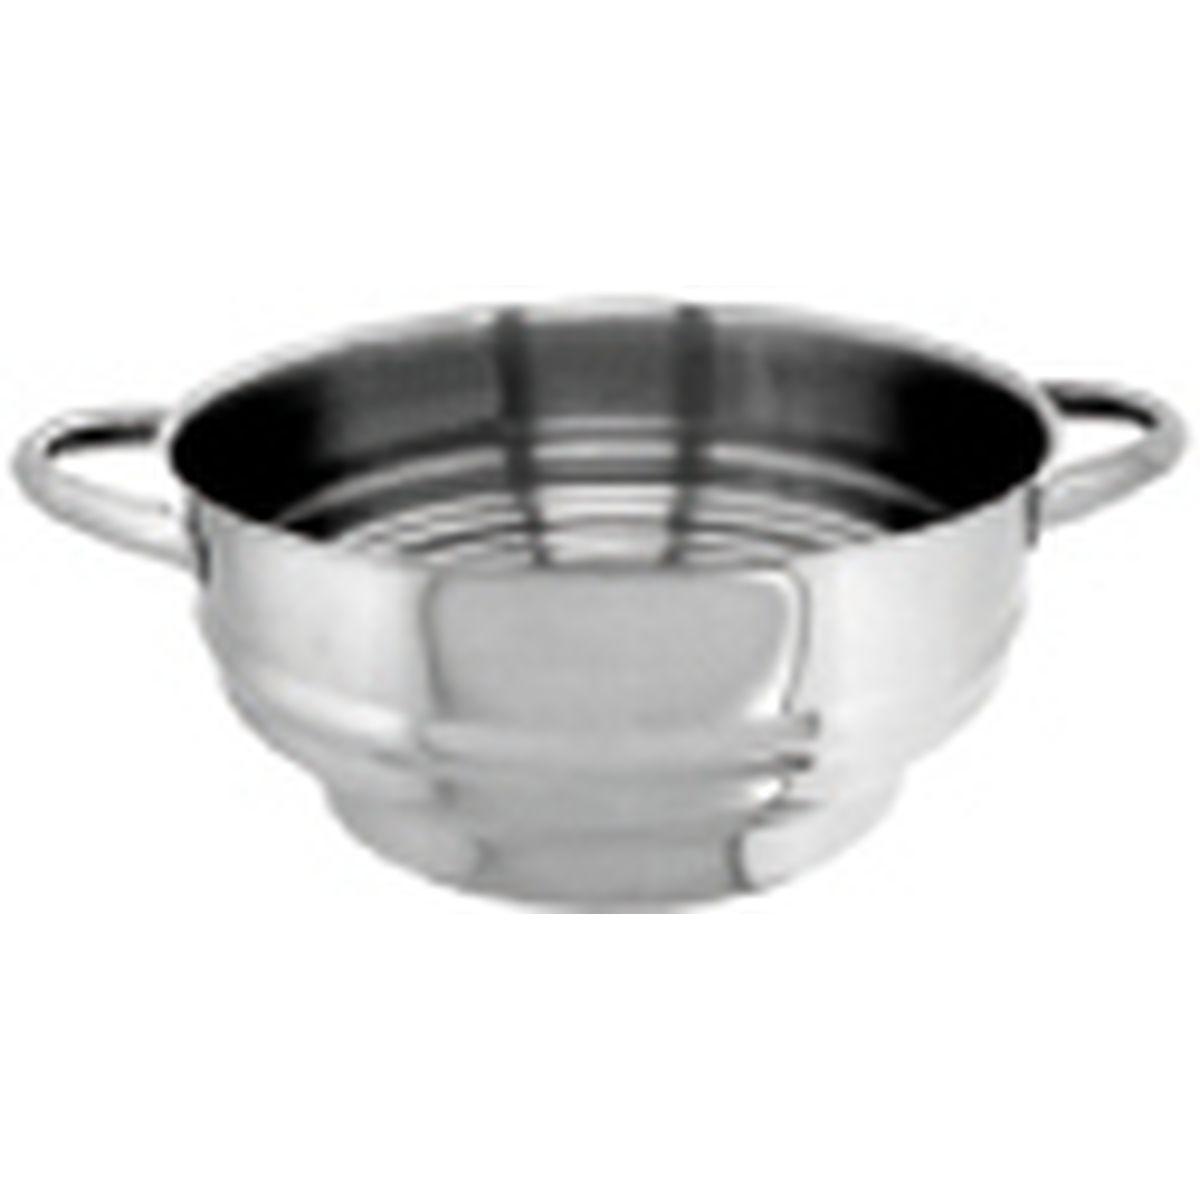 Passoire vapeur inox multi diamètres16 - 24 cm - Alice Delice